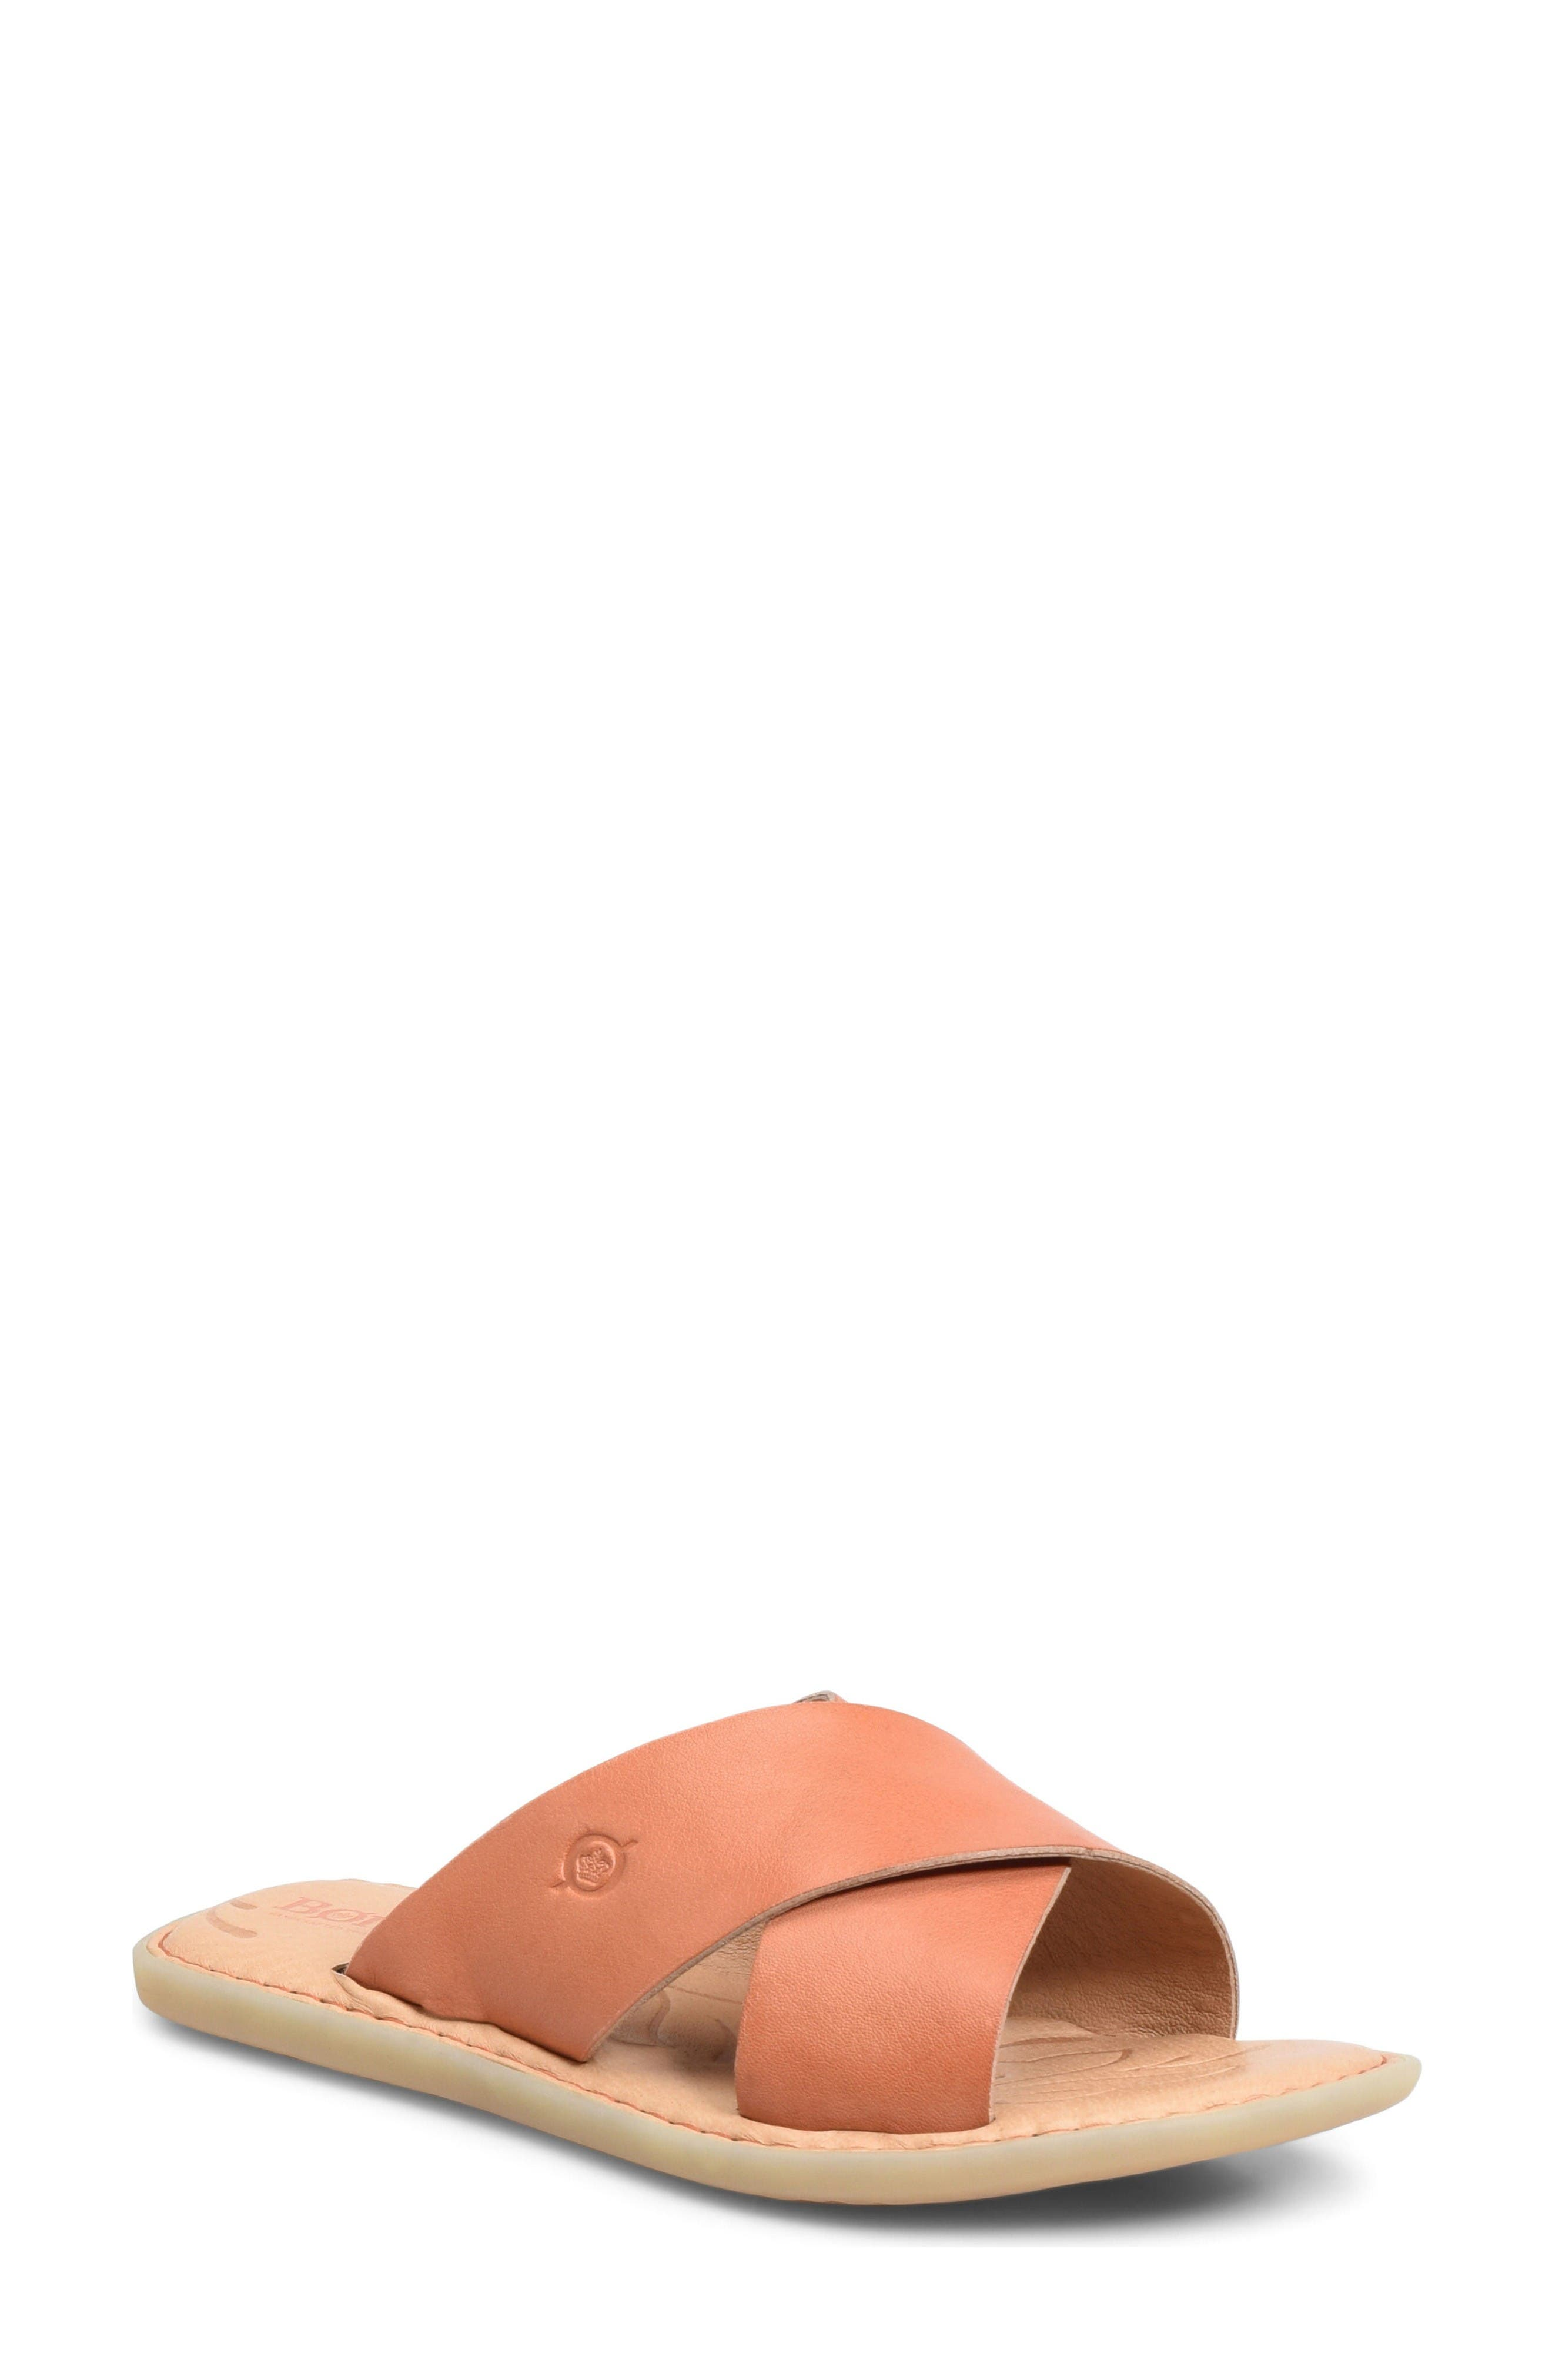 Børn Kula Slide Sandal (Women)